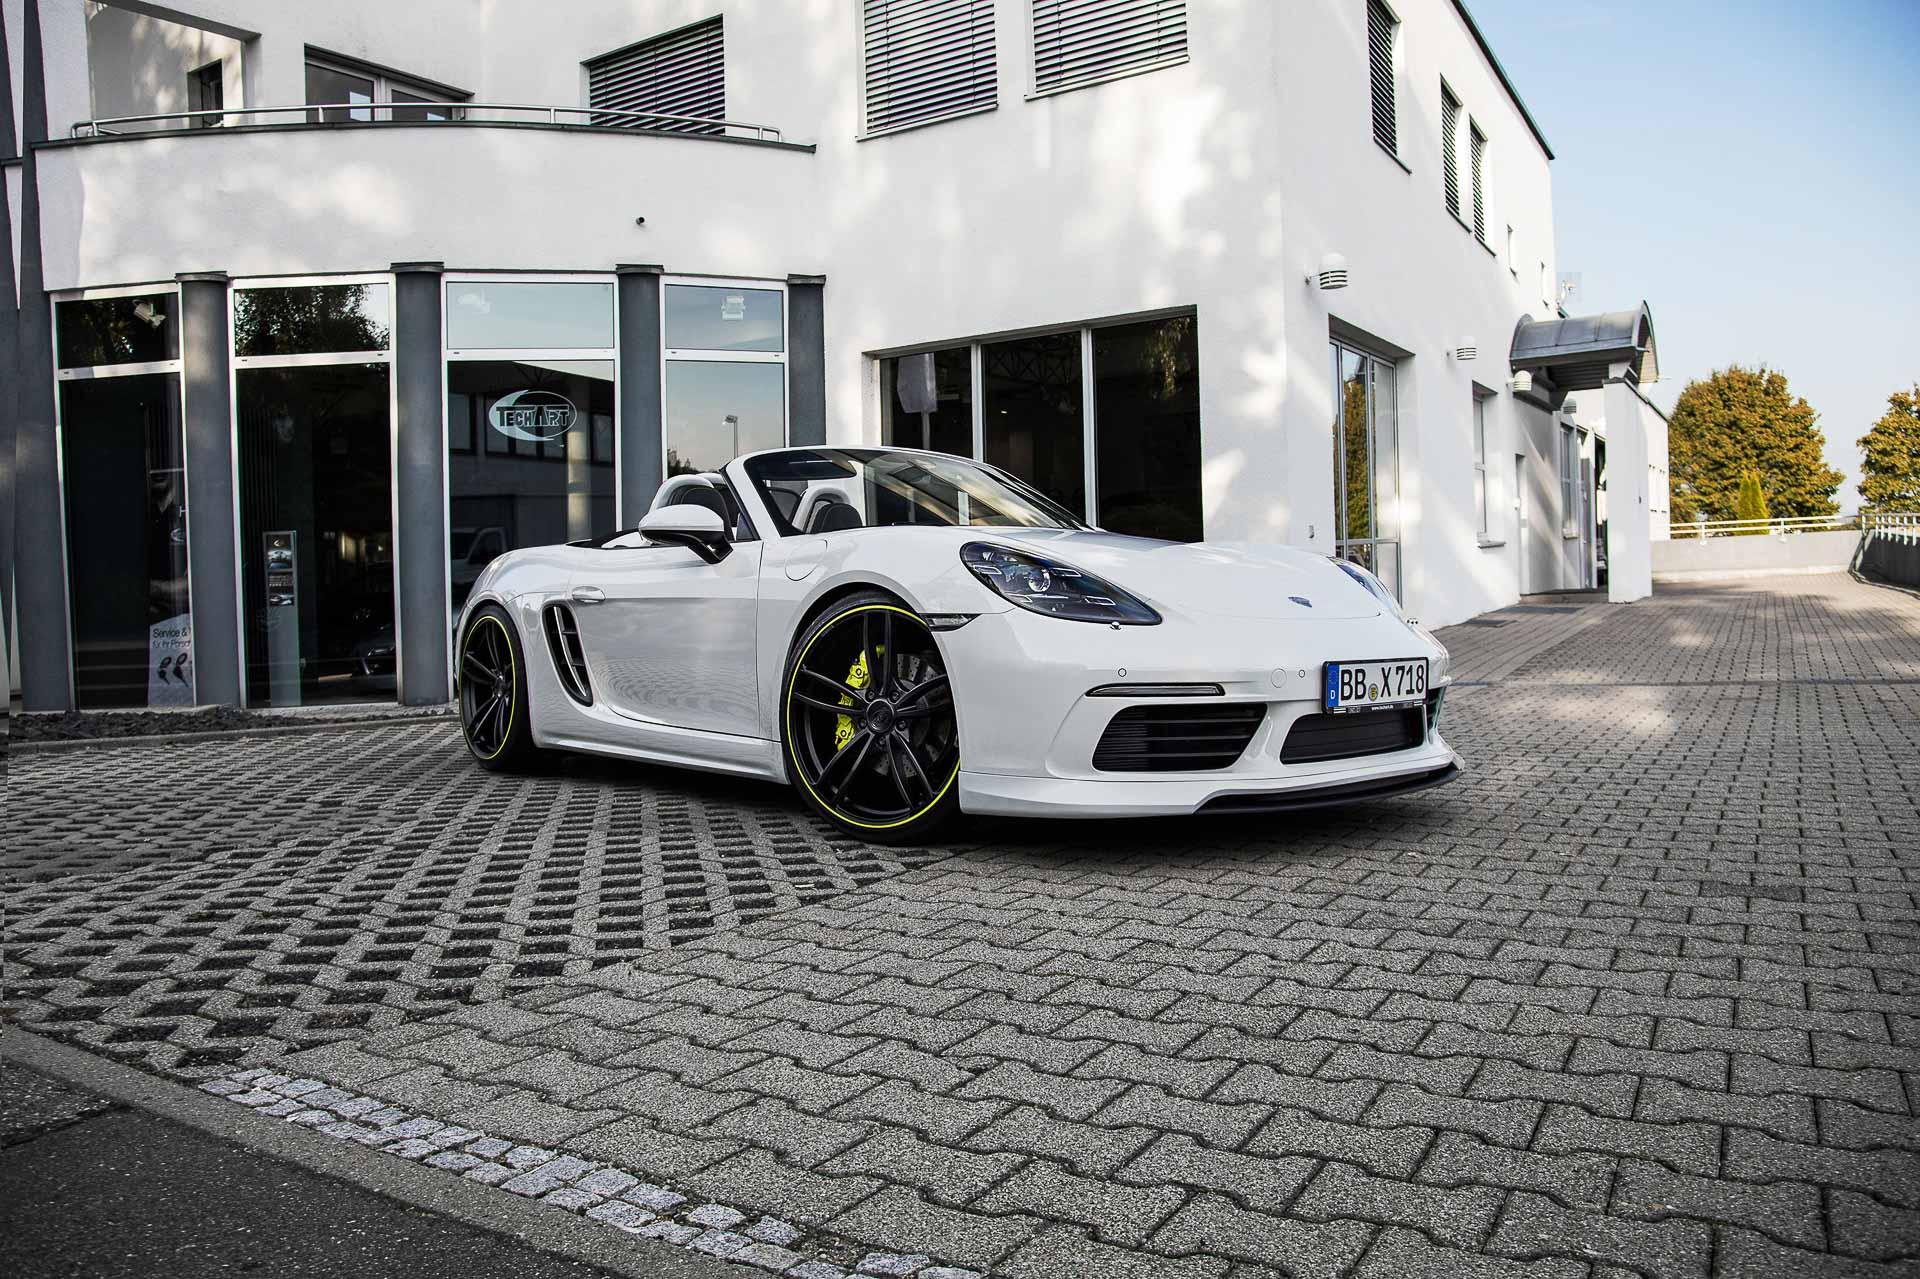 , Porsche 718 Cayman / Boxster, Pitlane Tuning Shop